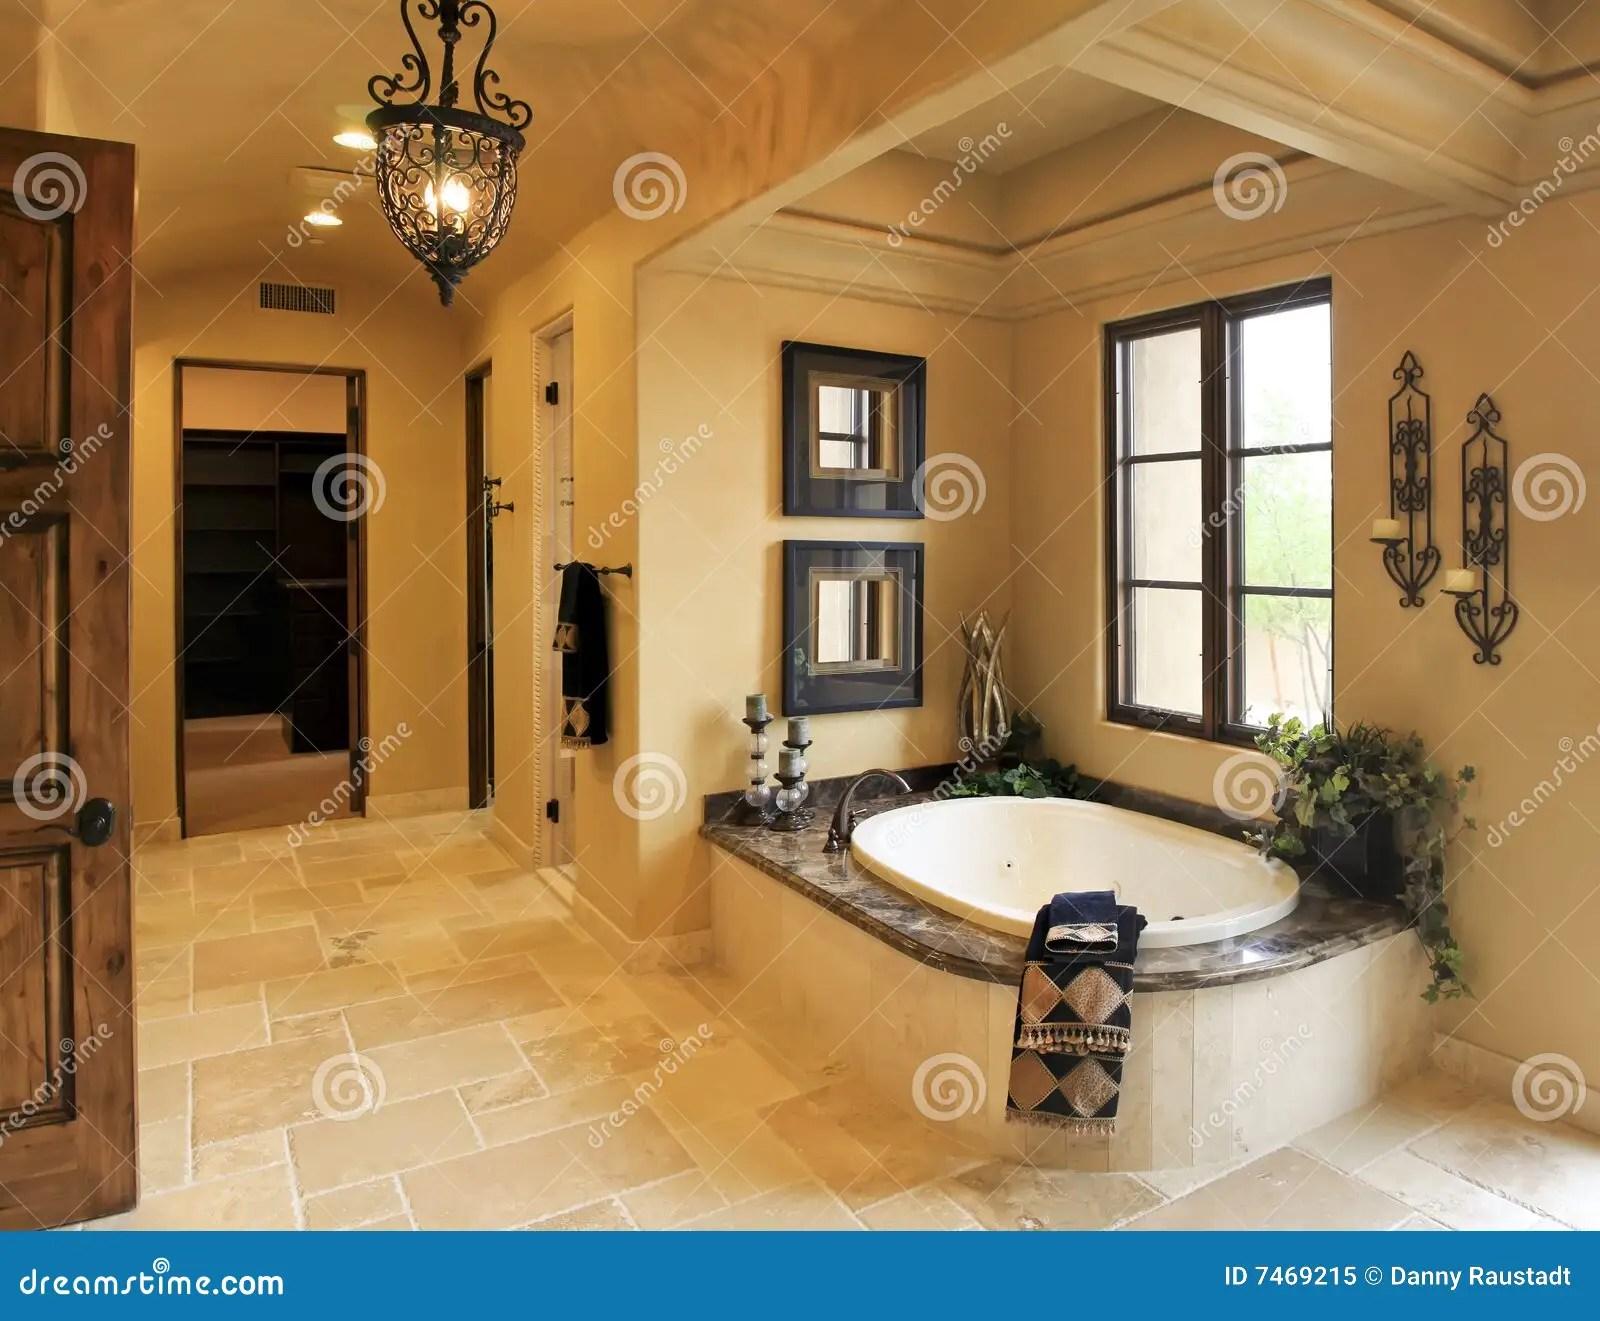 Resort Mansion Bathroom Spa Royalty Free Stock Photo